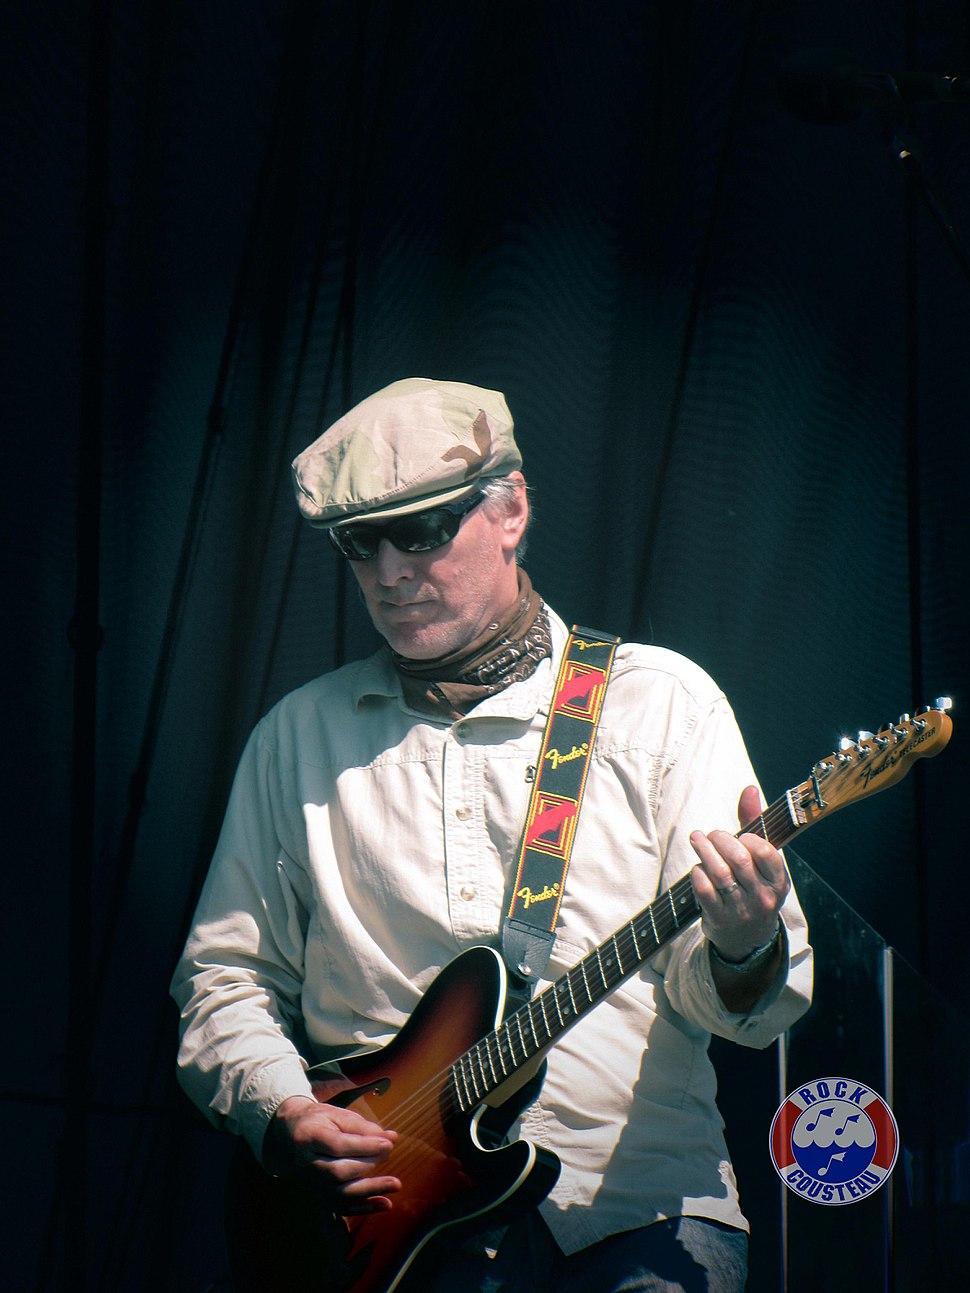 Steve Windwood toy2, Hangout Music Festival 2012